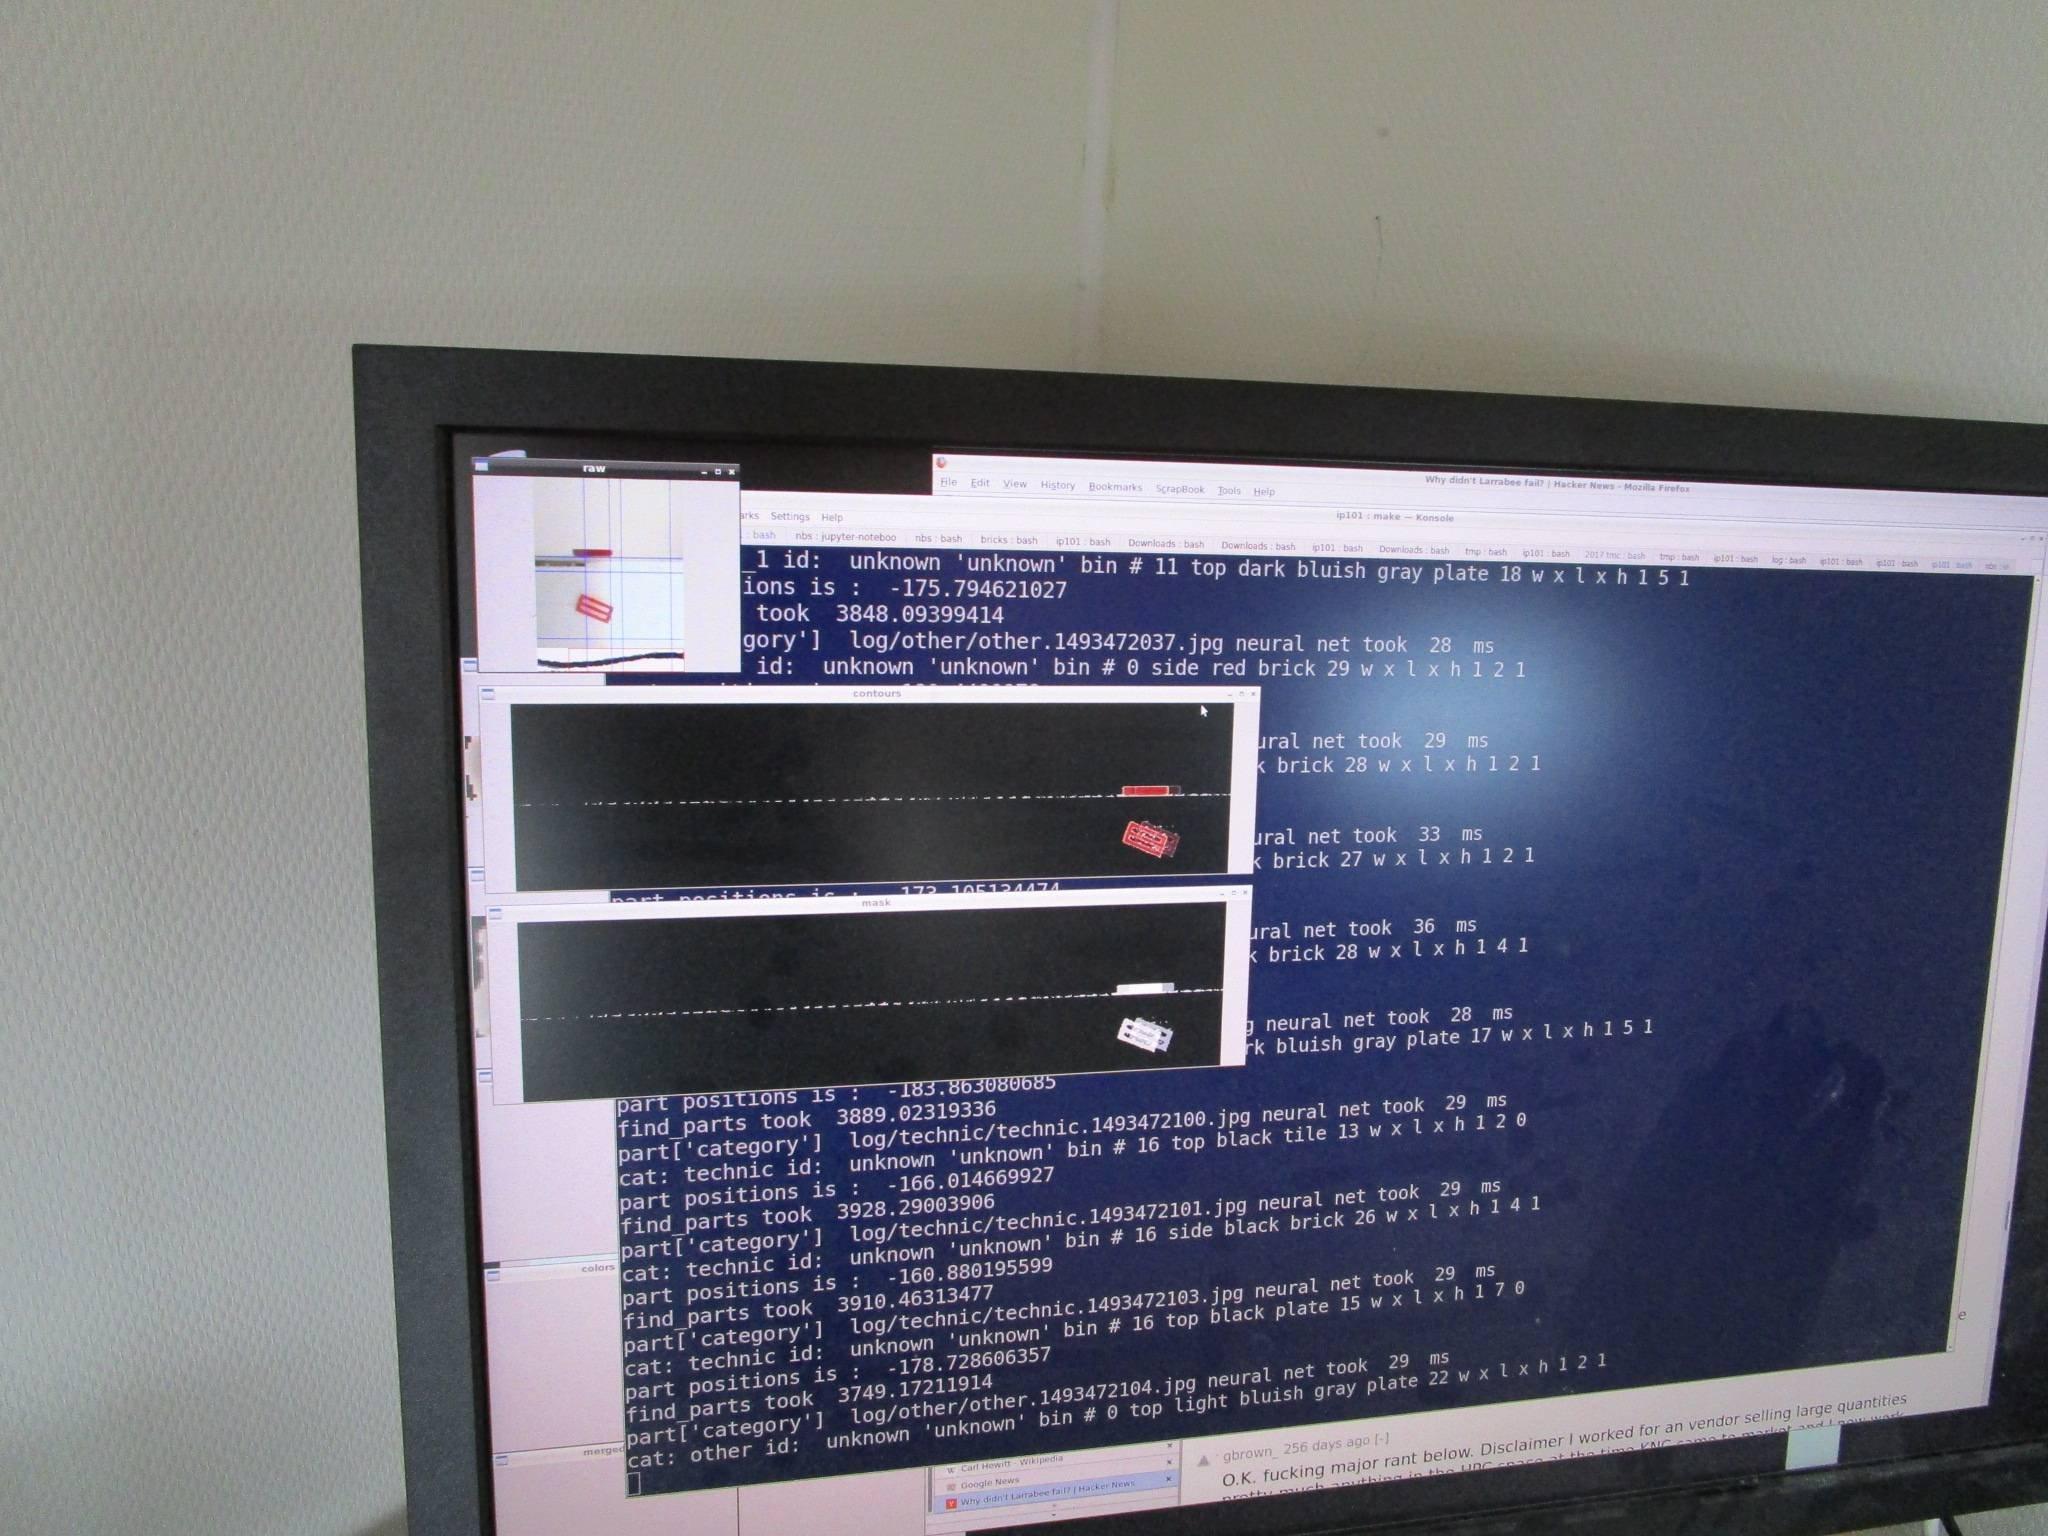 screenshot from machine learning